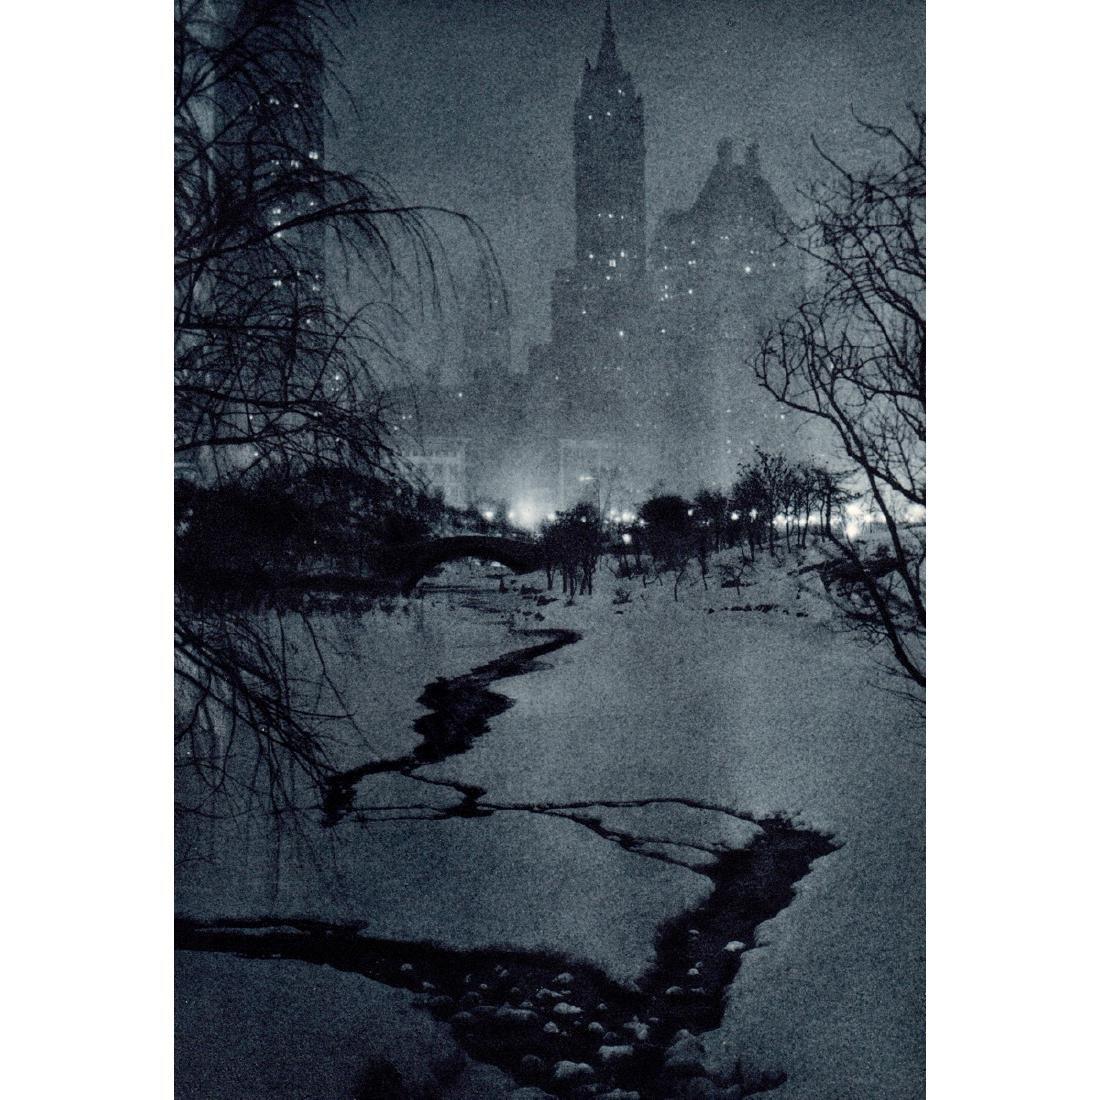 ADOLF FASSBENDER - The White Night